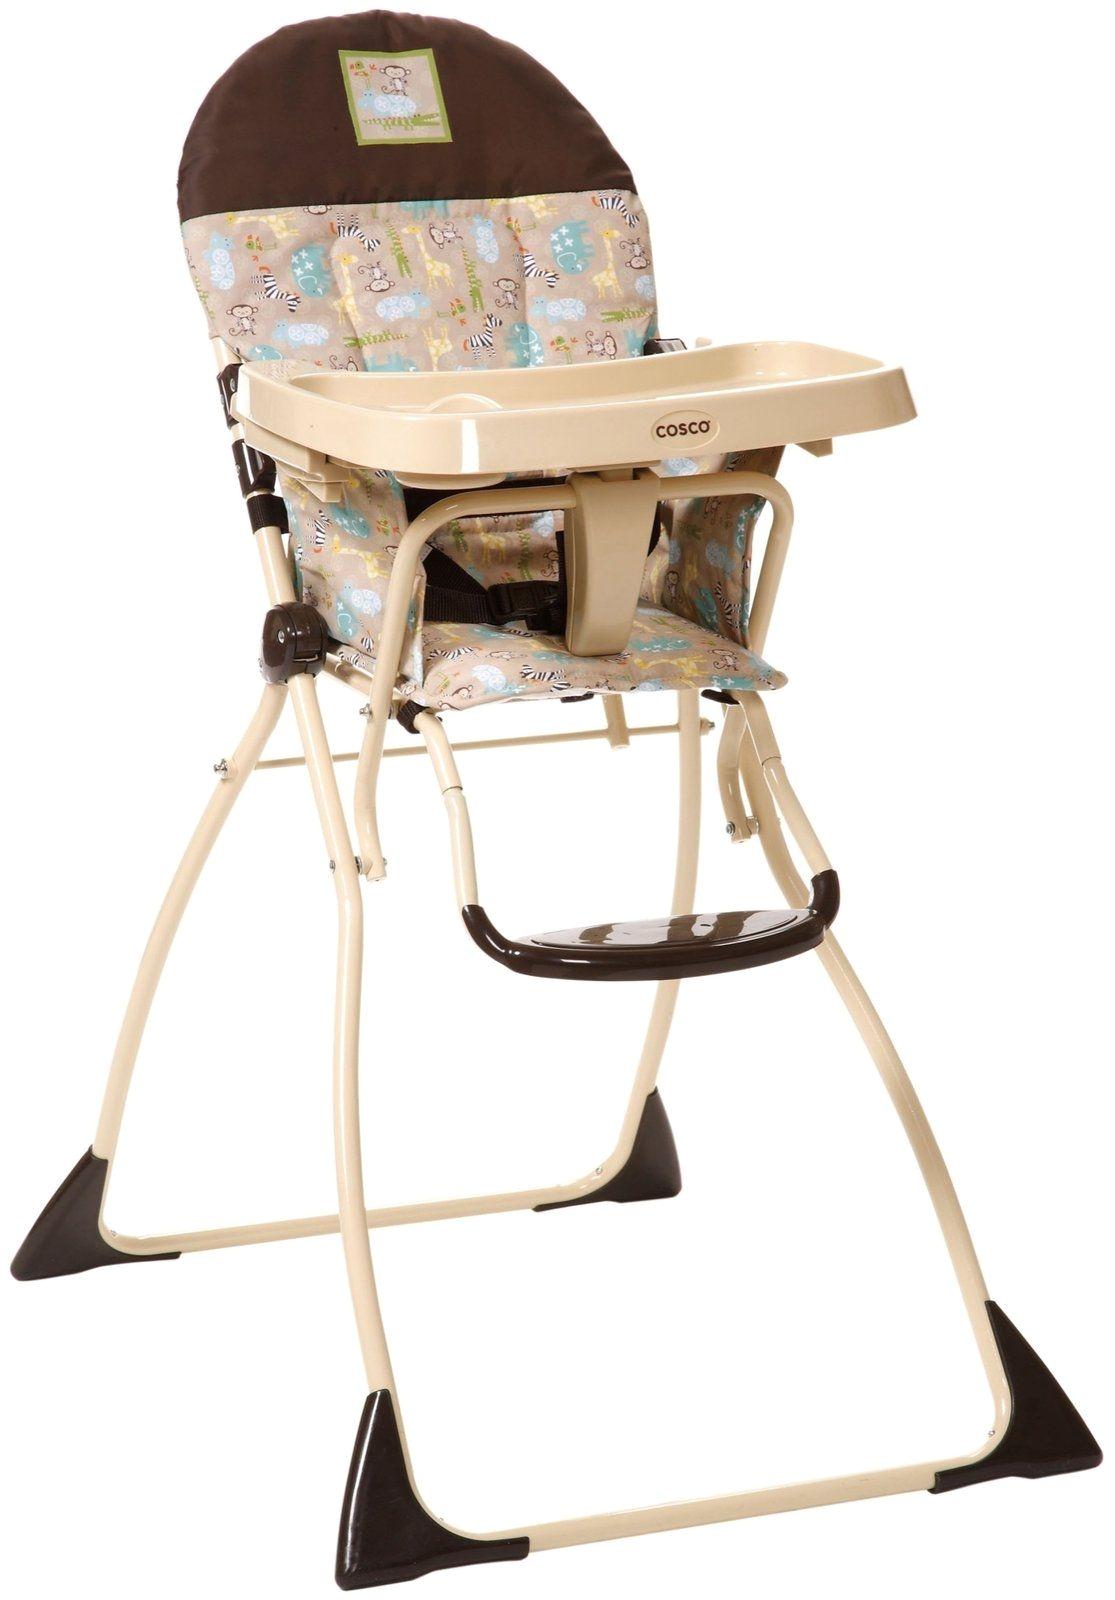 vintage cosco folding high chair